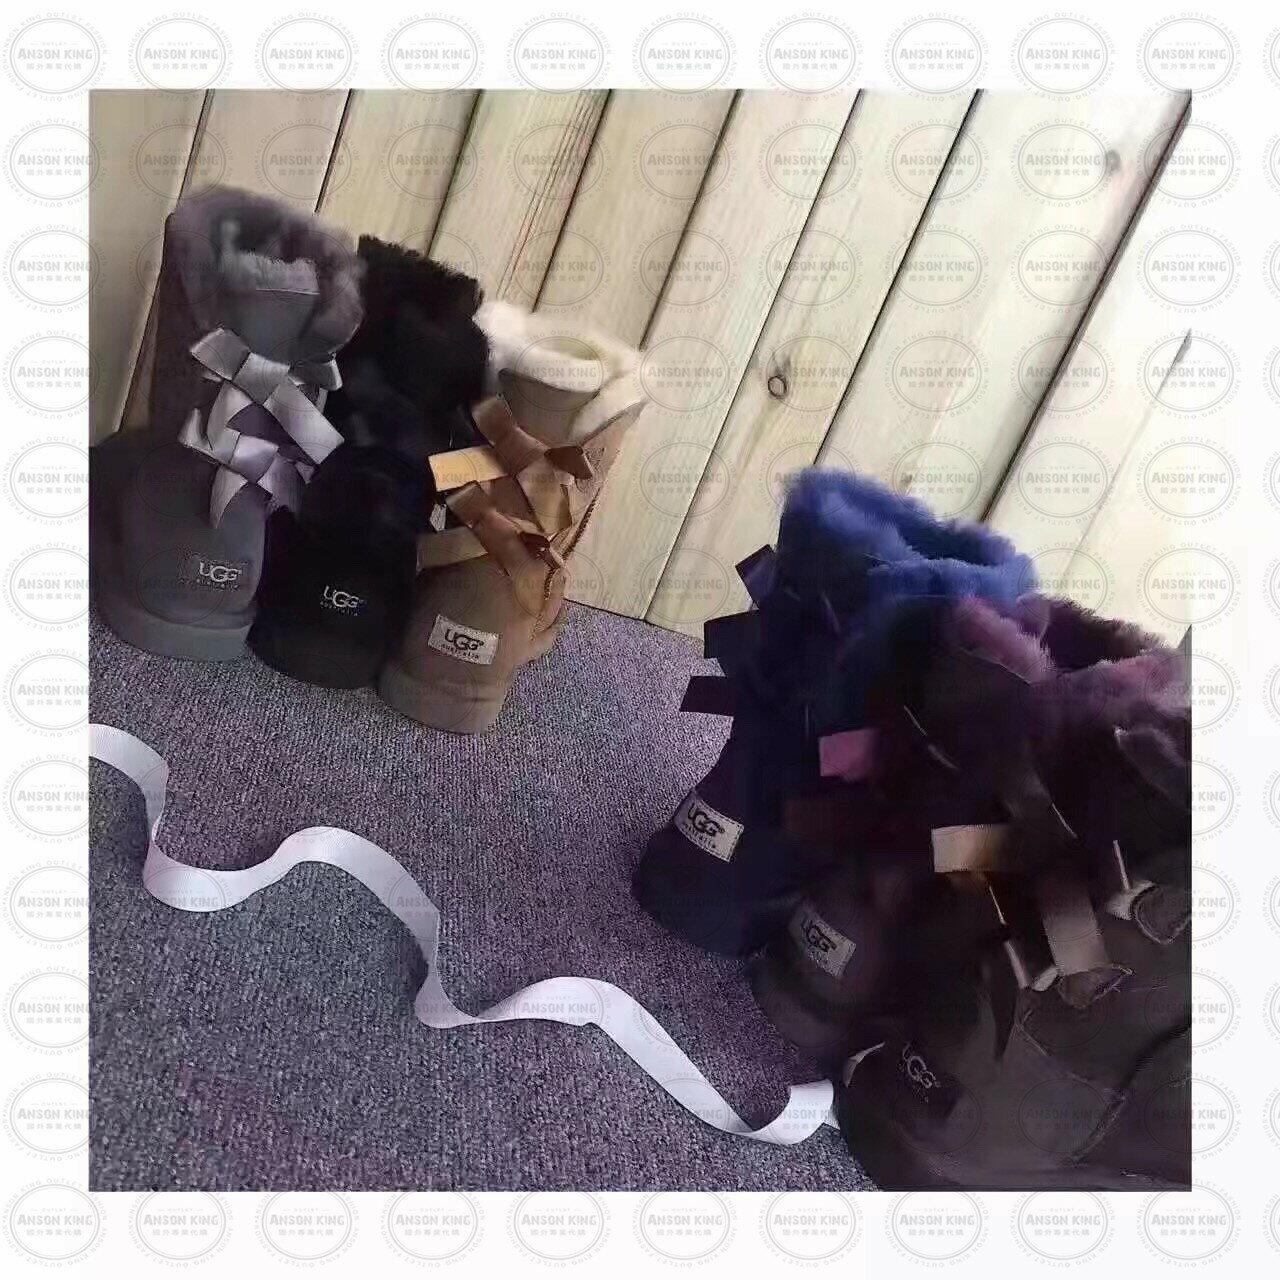 OUTLET正品代購 澳洲 UGG 蝴蝶結3280羊皮毛一體 中長靴 保暖 真皮羊皮毛 雪靴 短靴 深褐色 2